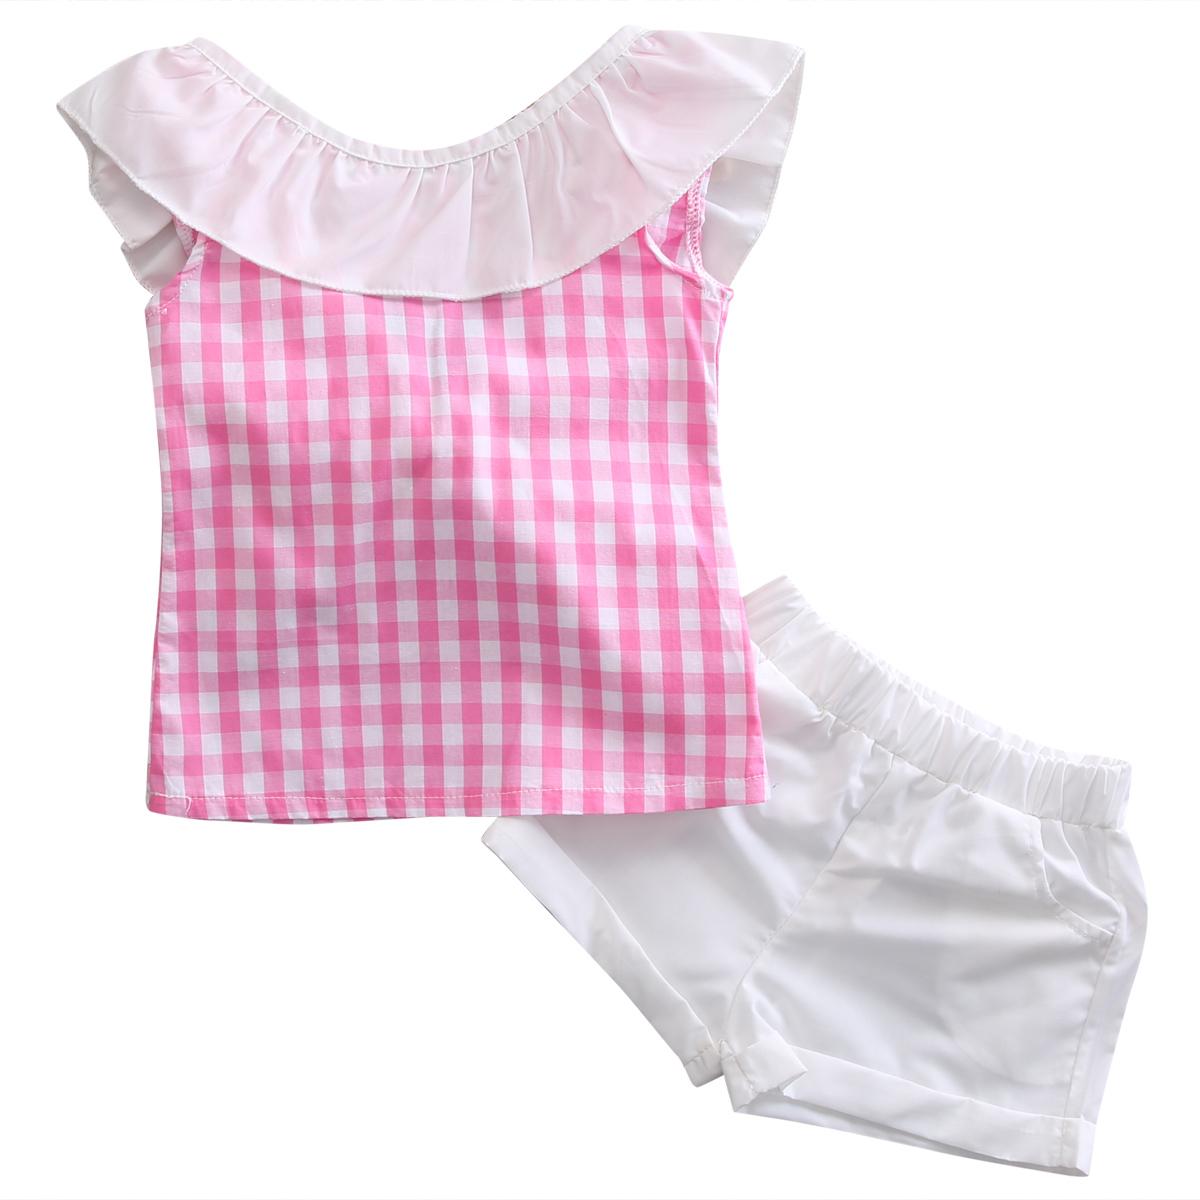 Summer Kids Girls Bowknot Plaids T-shirt Tops Bottom Shorts Clothes Outfits  Set Pink Green Ruffles Children Clothing